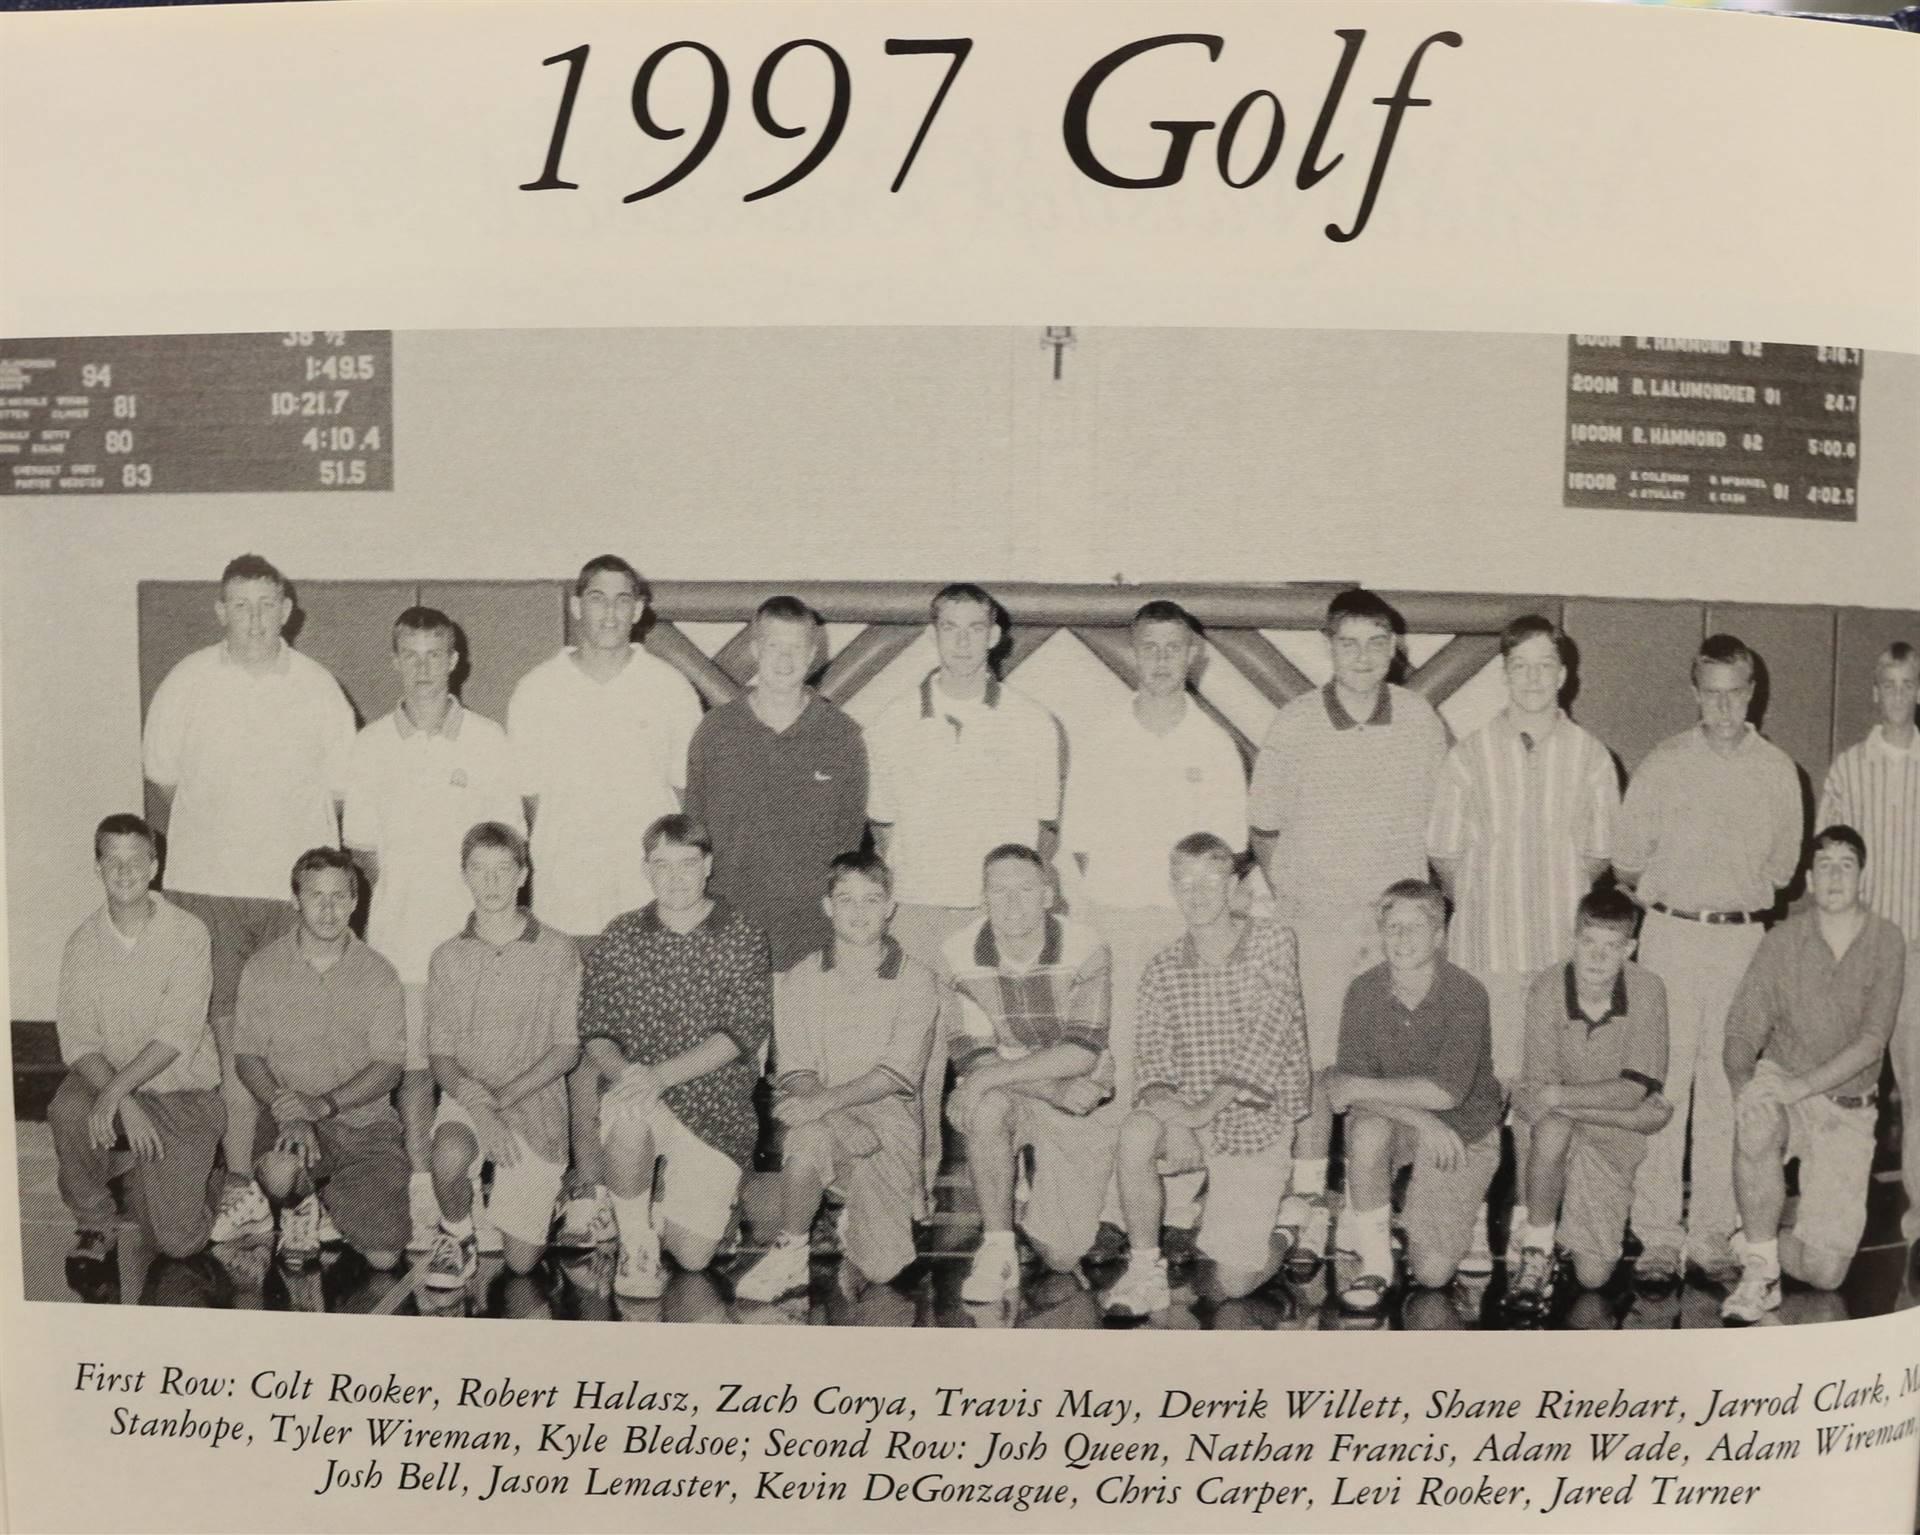 1998 Golf